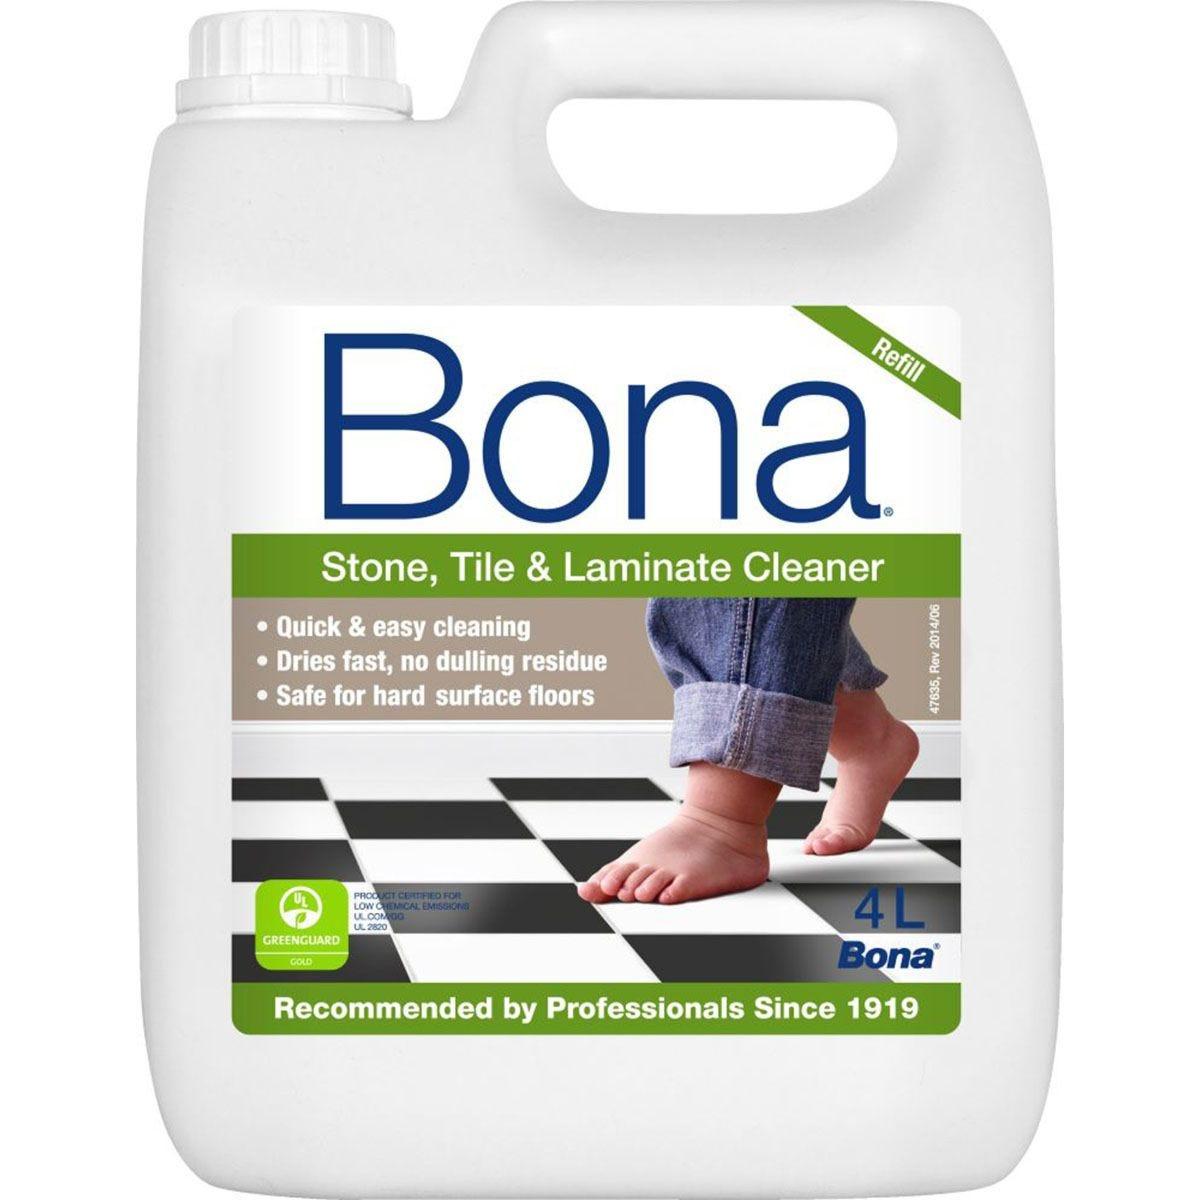 Bona Stone, Tile and Laminate Floor Cleaner Refill - 4L